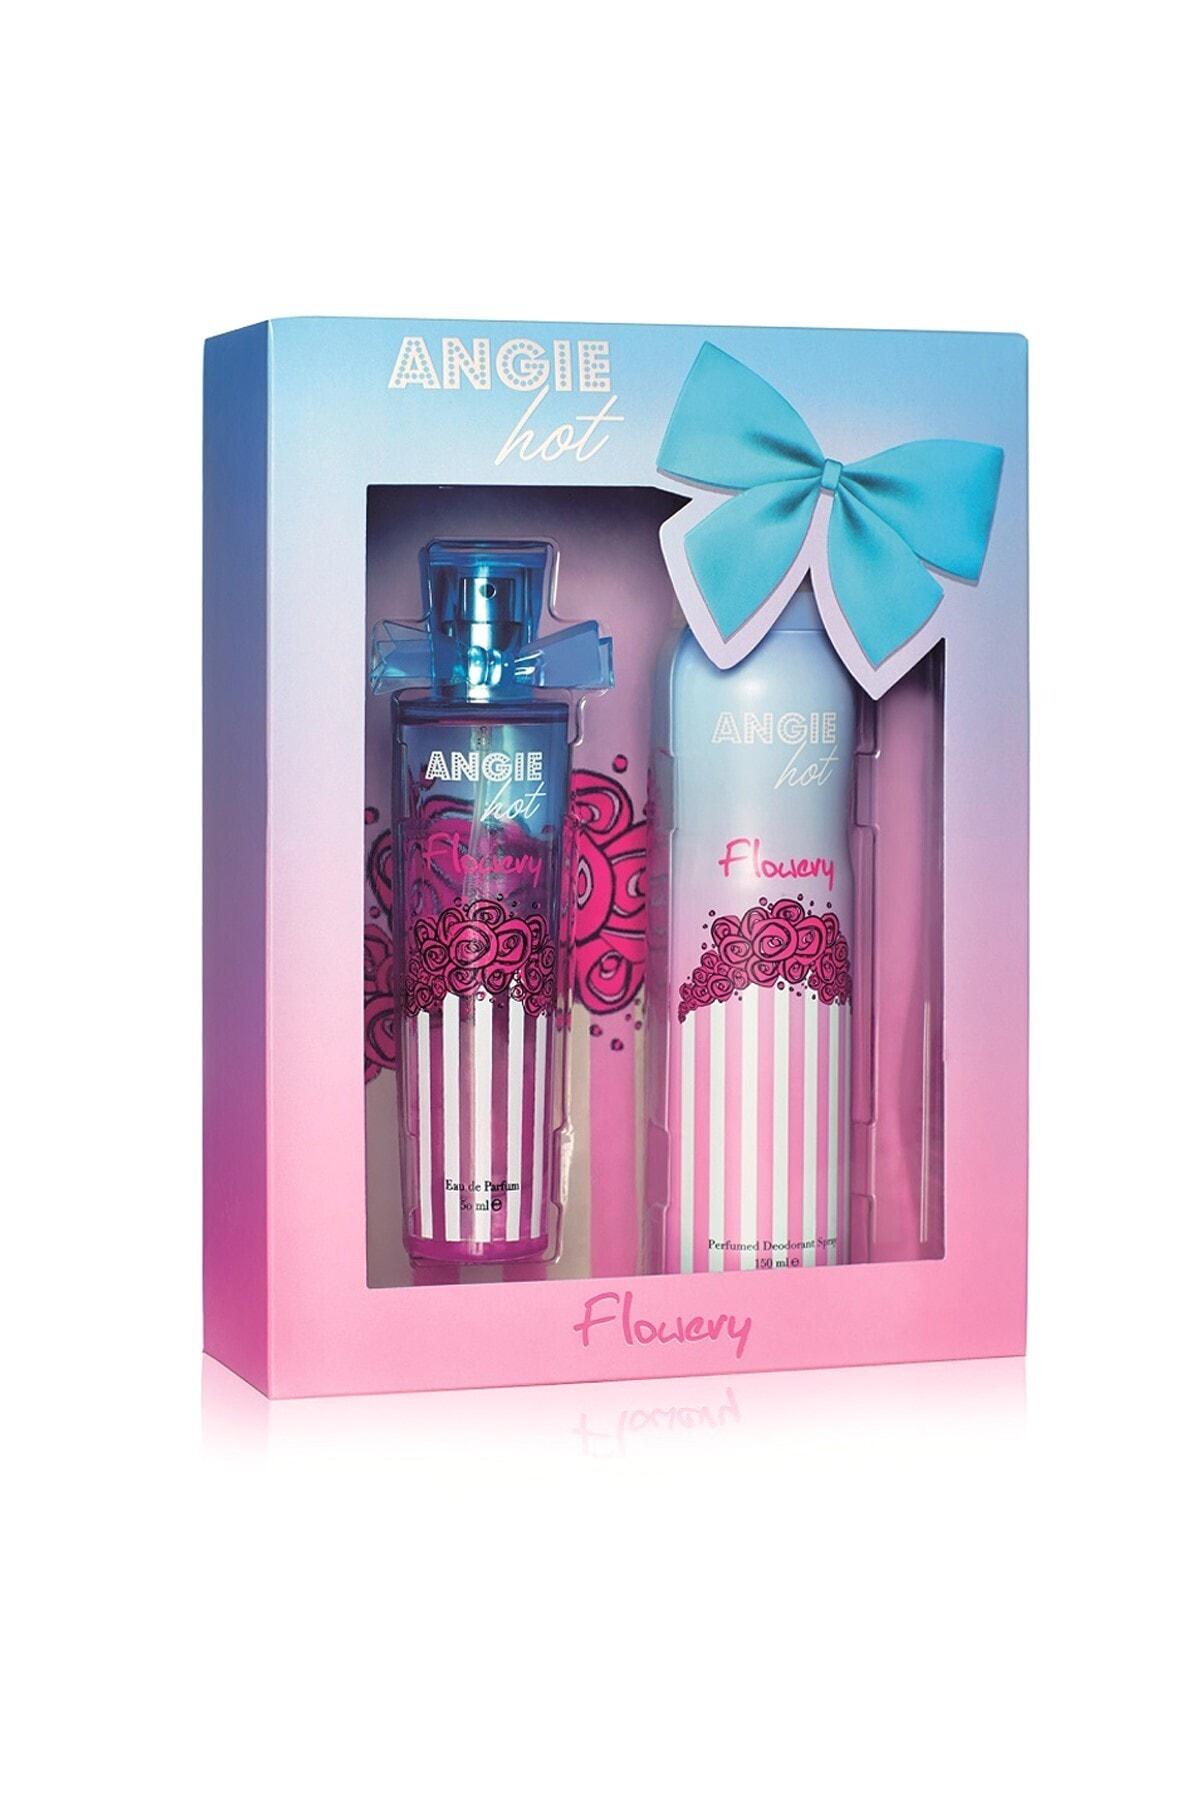 Rebul Angie Hot Flowery Edp 50 ml + Deodorant 150 ml Kadın Parfüm Seti 8691226601076 1